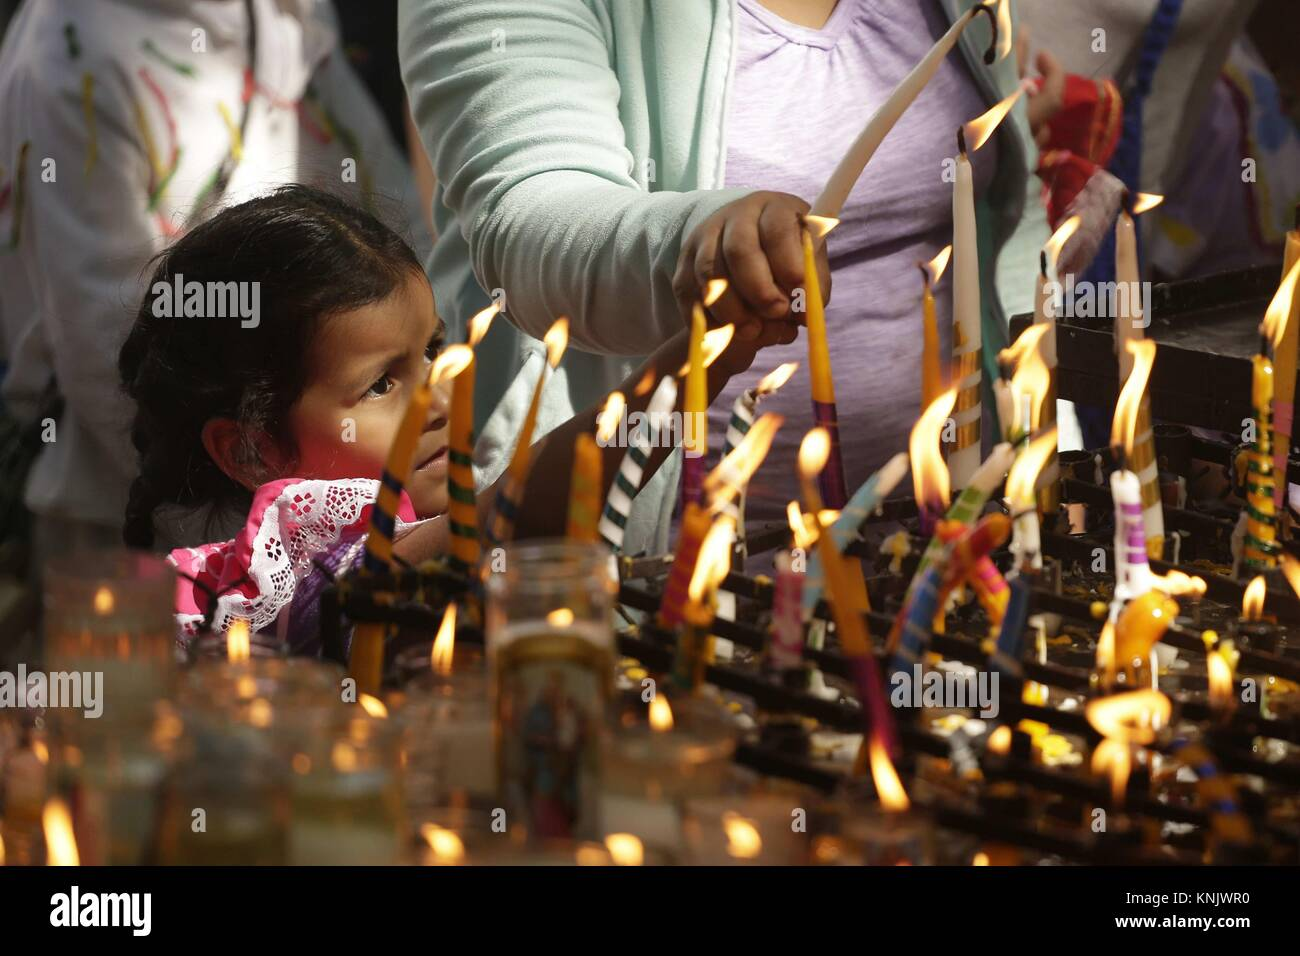 San Salvador, El Salvador. 12th Dec, 2017. Pilgrims light candles in honor of the Virgin of Guadalupe in San Salvador, Stock Photo